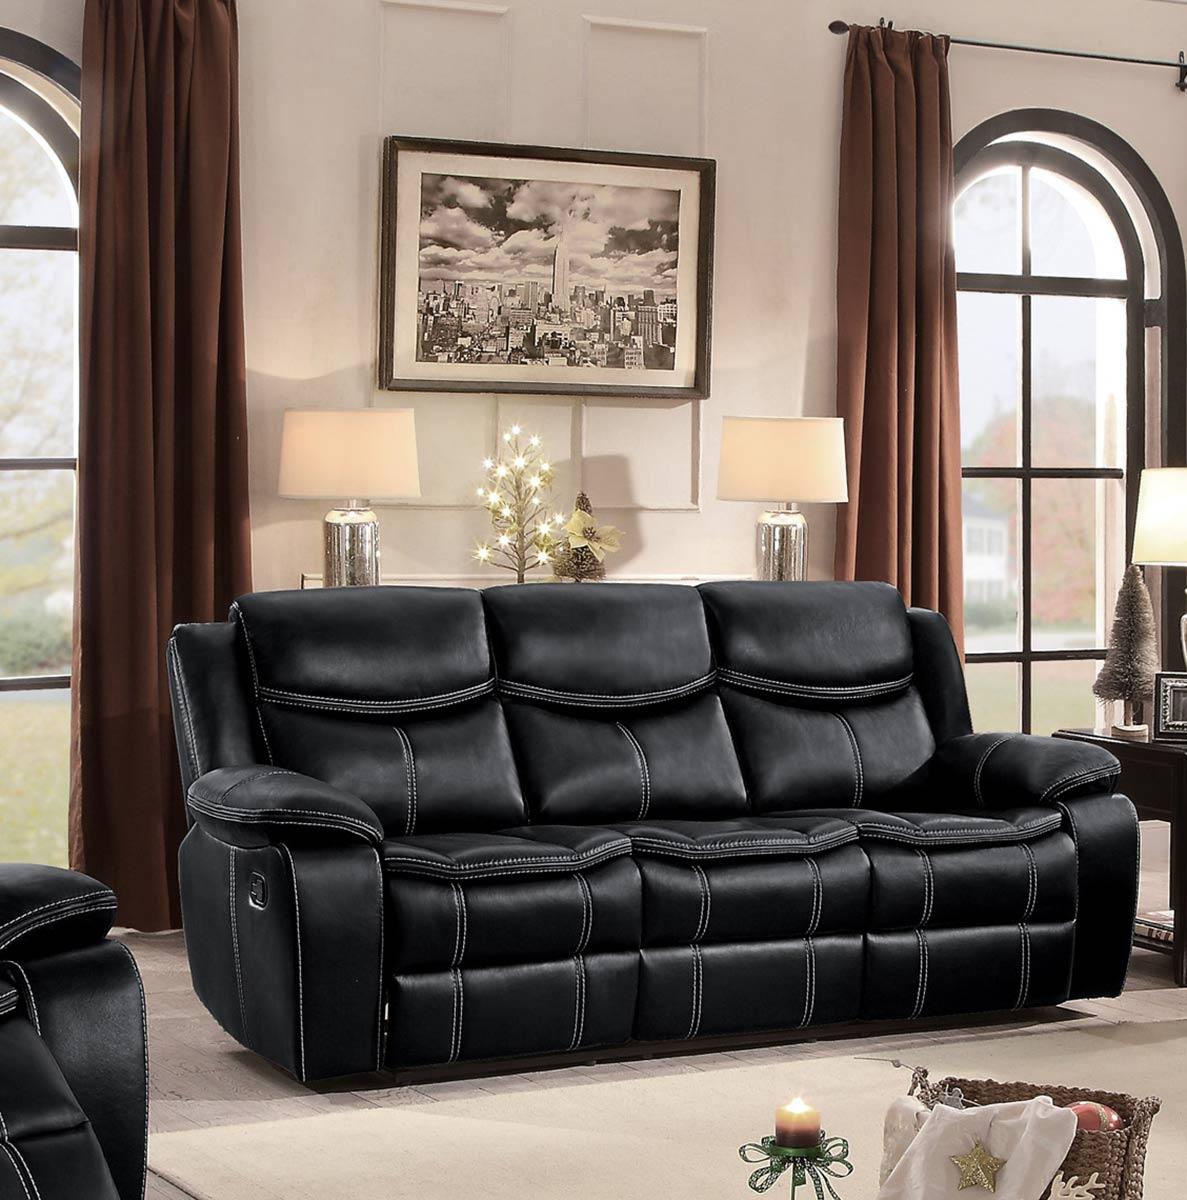 Homelegance Bastrop Double Reclining Sofa - Black Leather Gel Match